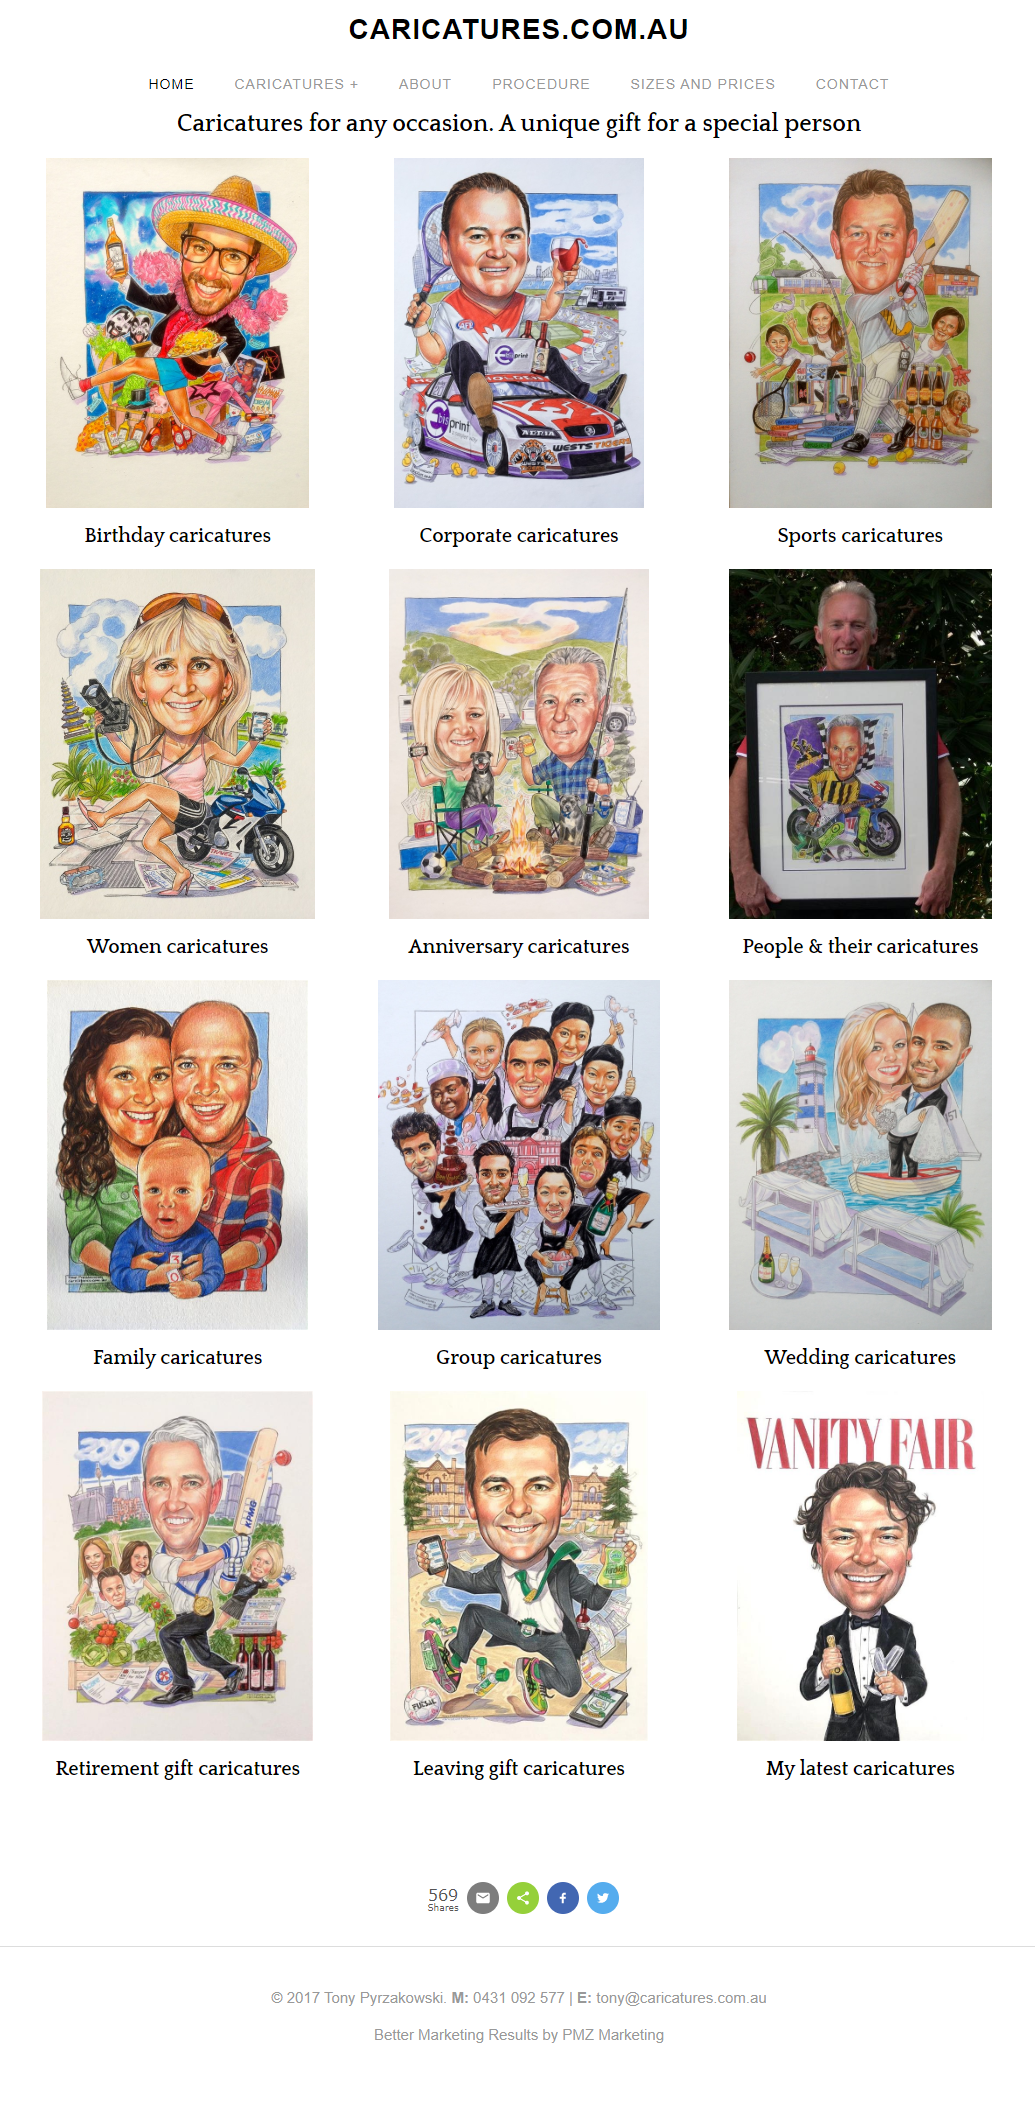 Marketing - Caricatures.Com.Au :: PMZ Marketing Client